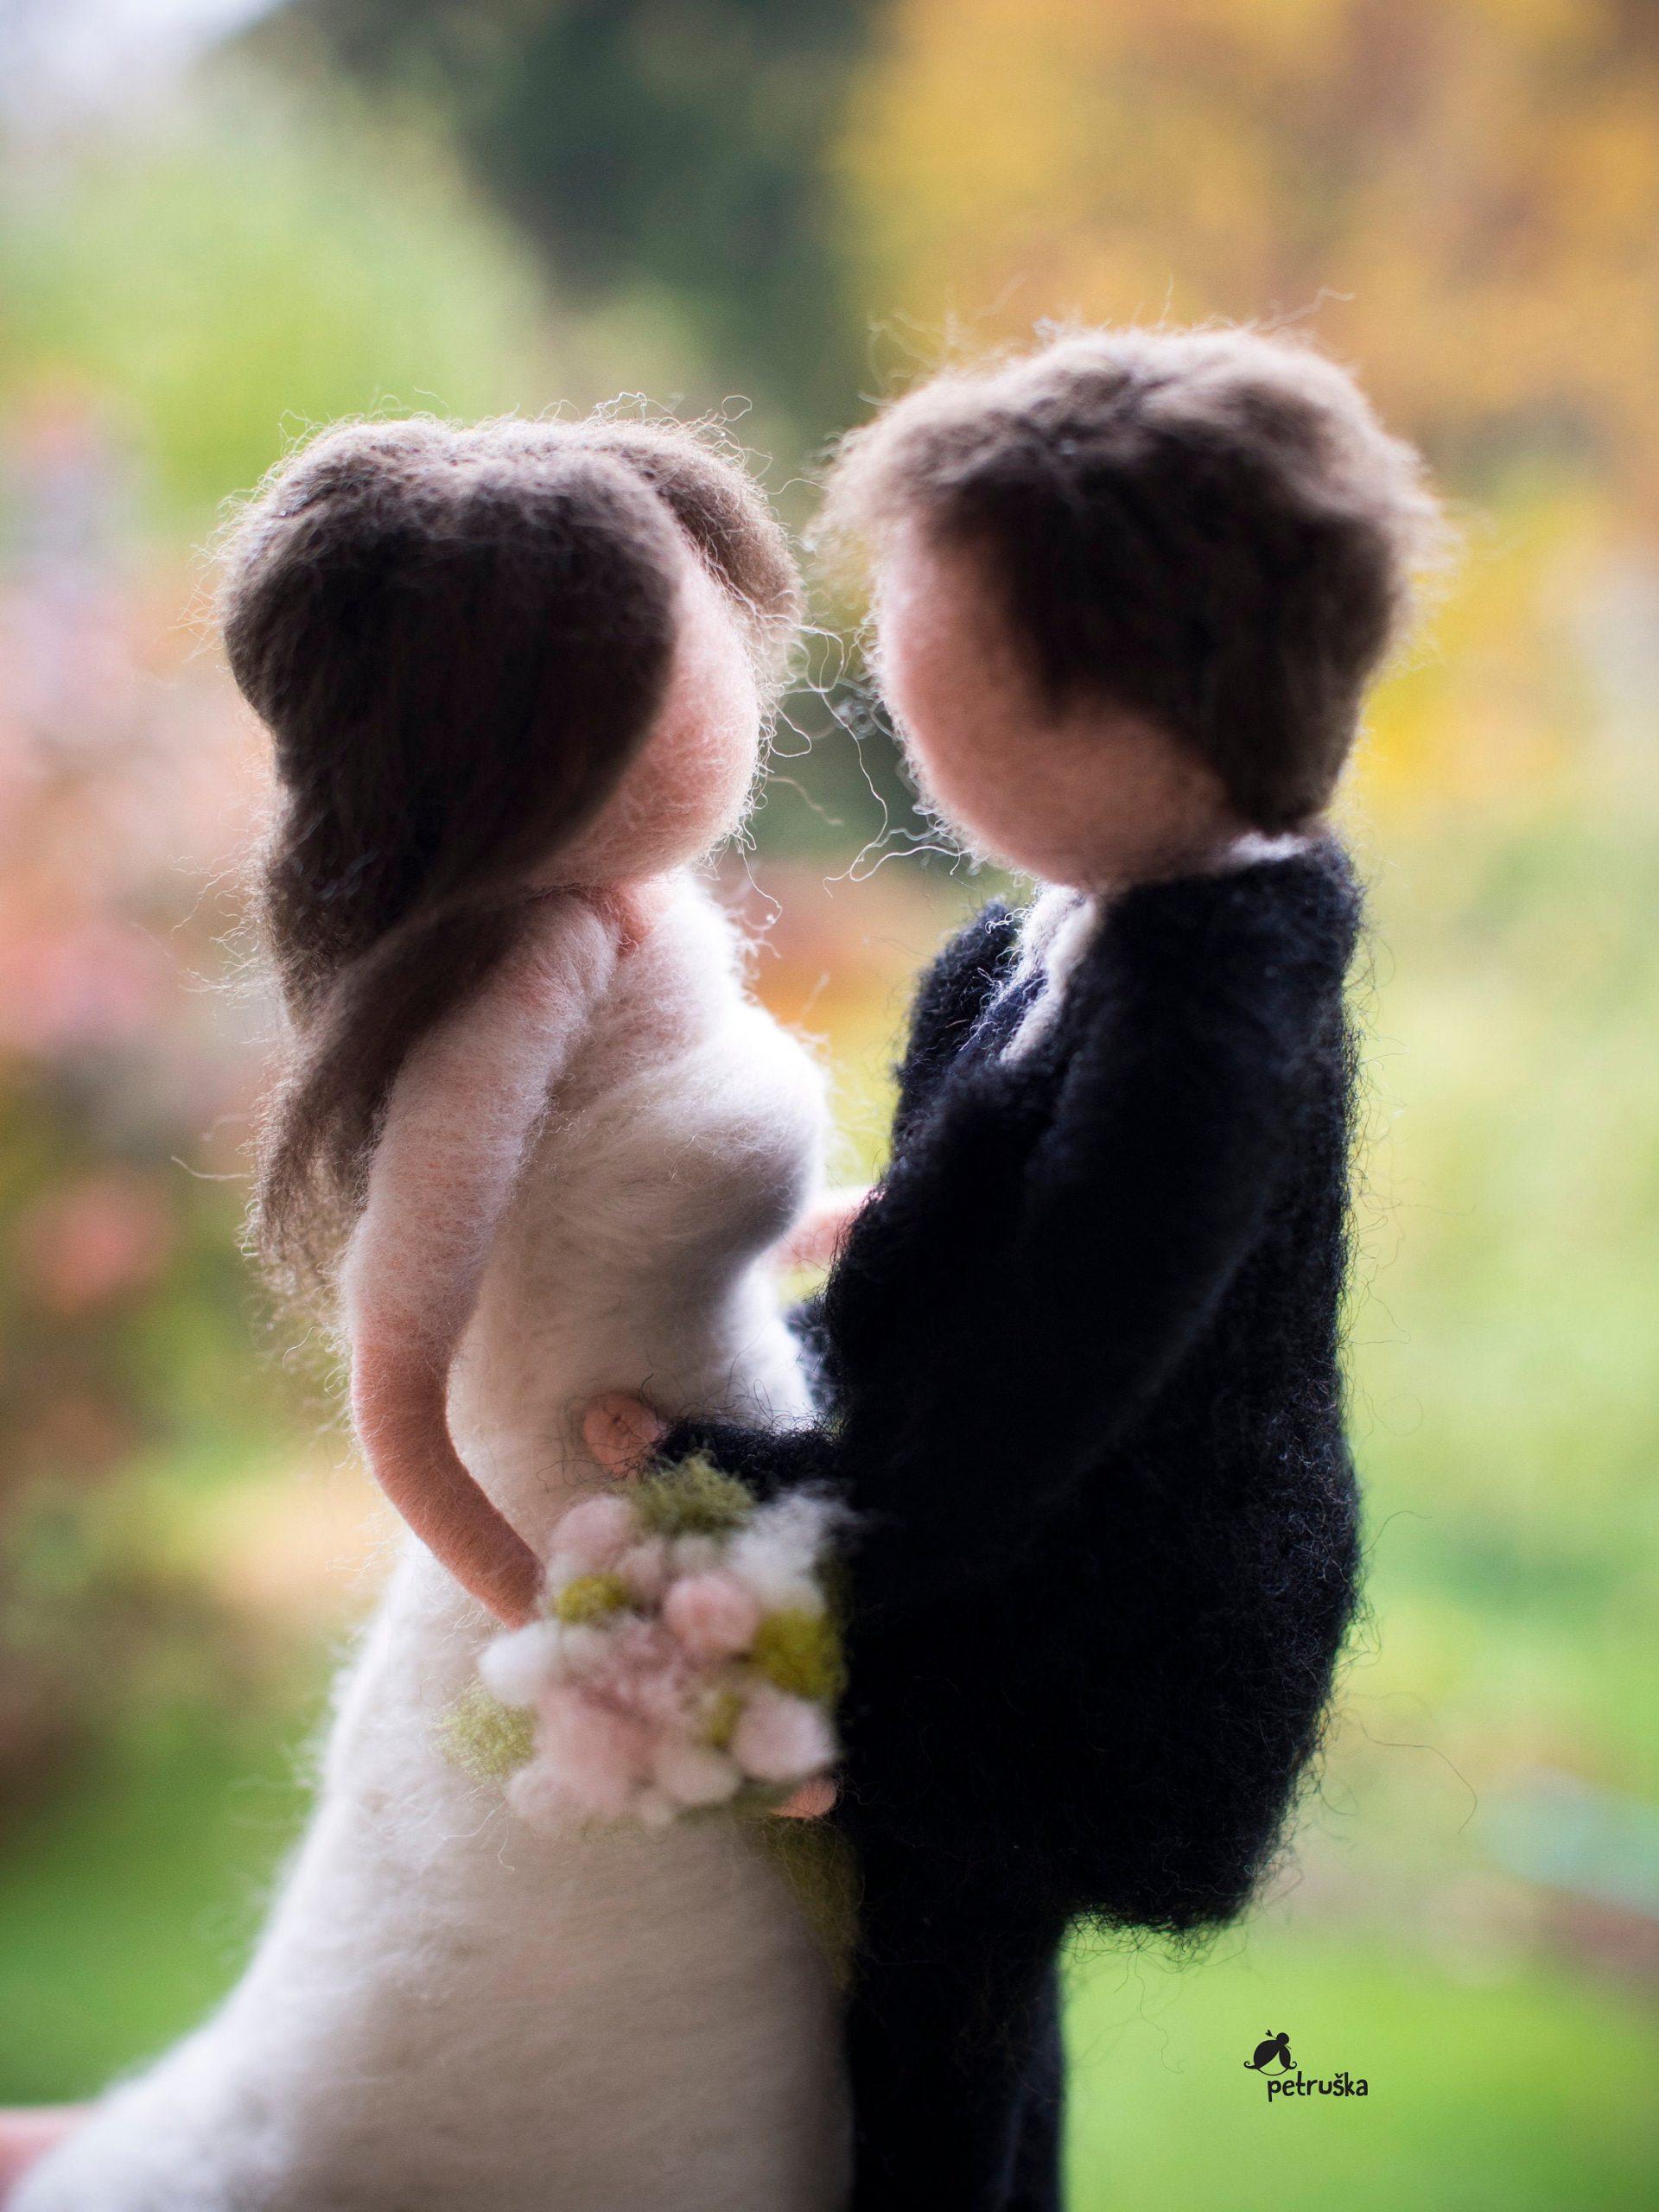 Bride & Groom Wedding Figurine, Custom Cake Topper, Couple Portrait